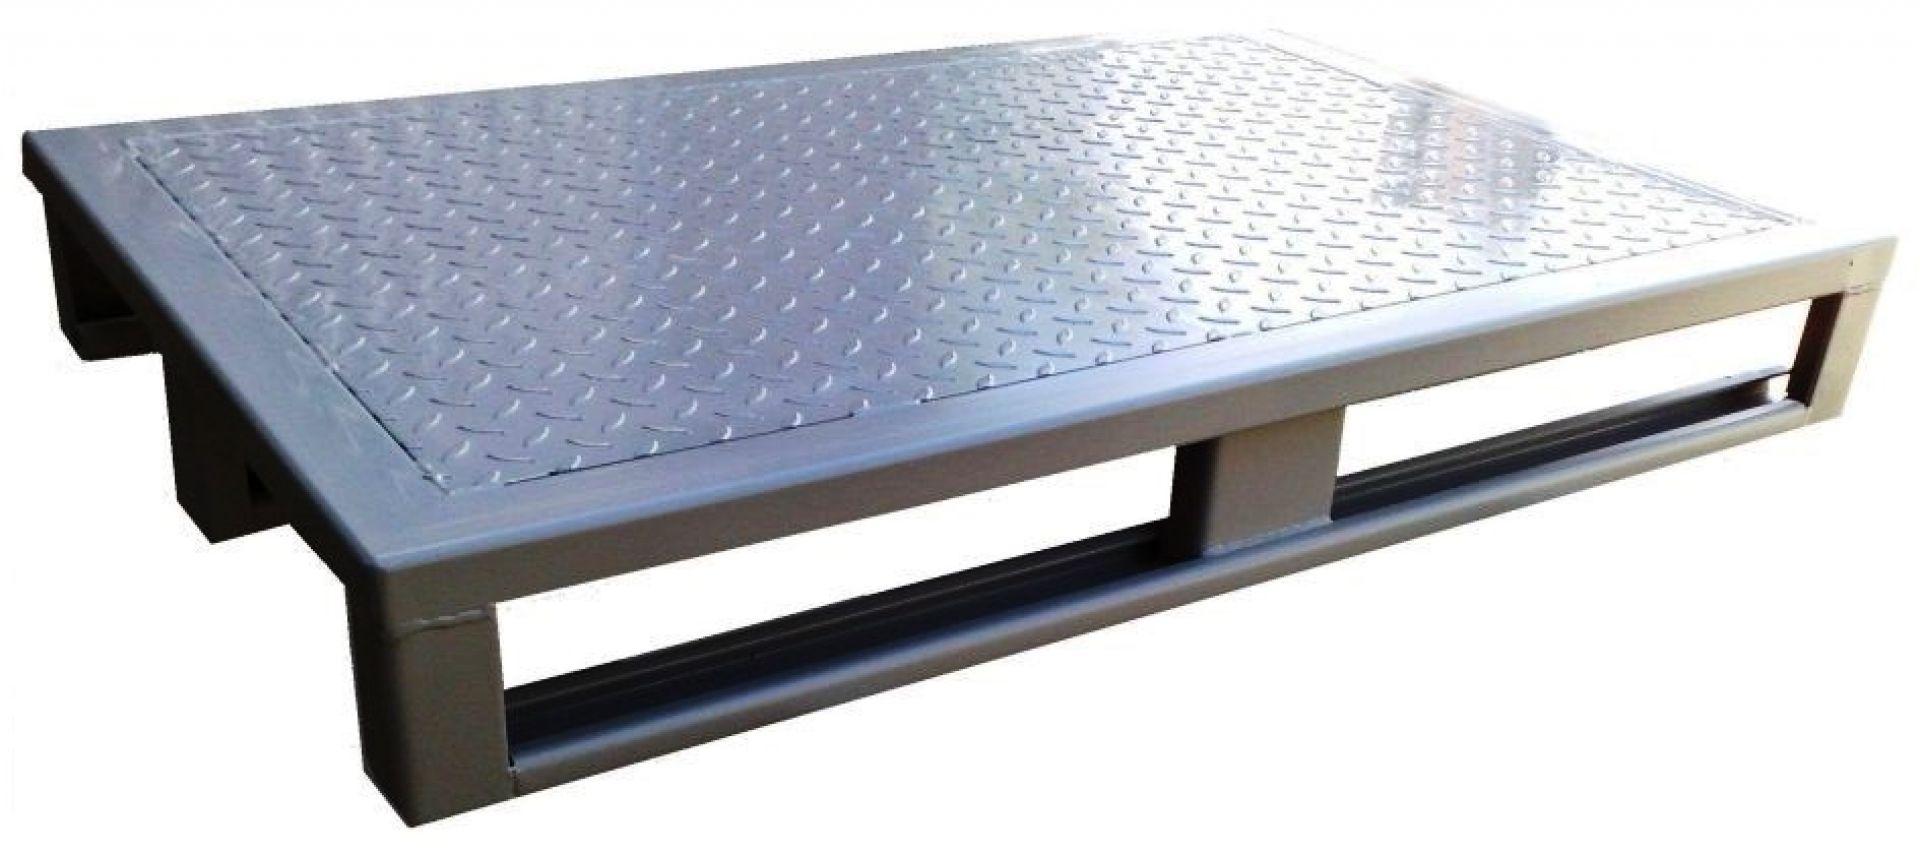 Stahlblechpalette mit Riffelblech